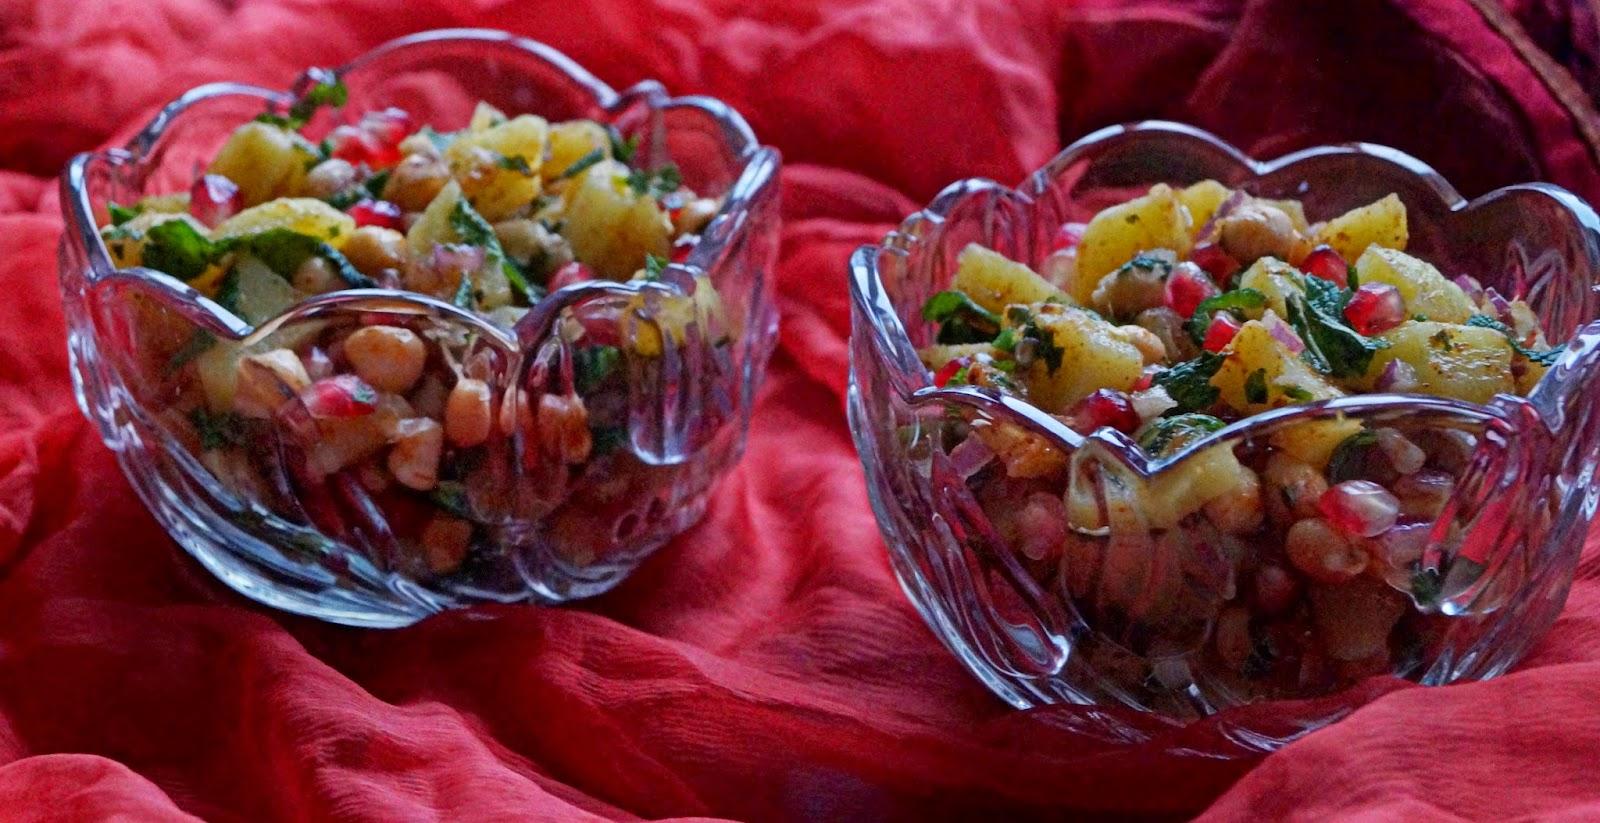 http://cupcakeluvs.blogspot.dk/2014/11/granatble-chaat-anar-chaat-pommegrante.html